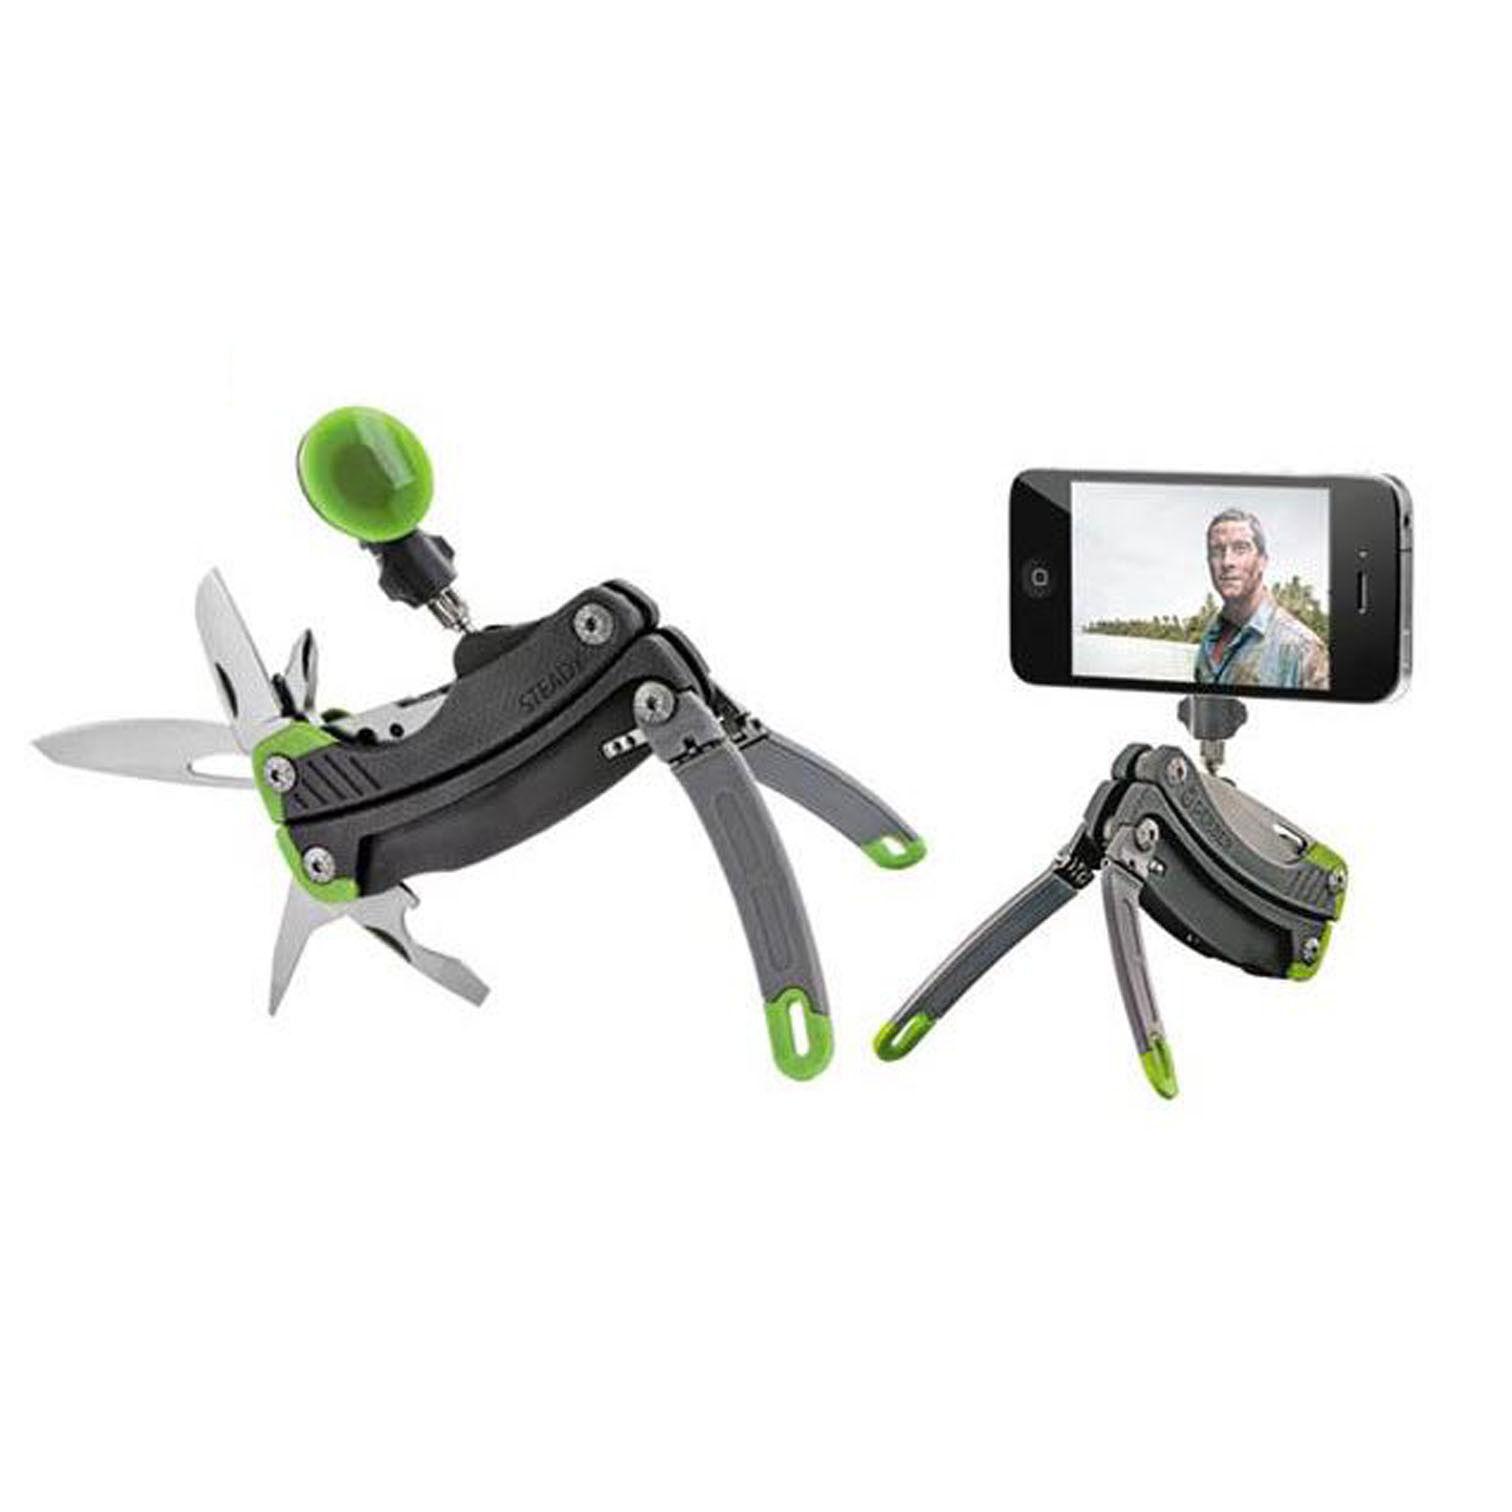 Gerber Multi  Tool Steady Bear Grylls Tripod iPhone Smartphon Camera  sales online